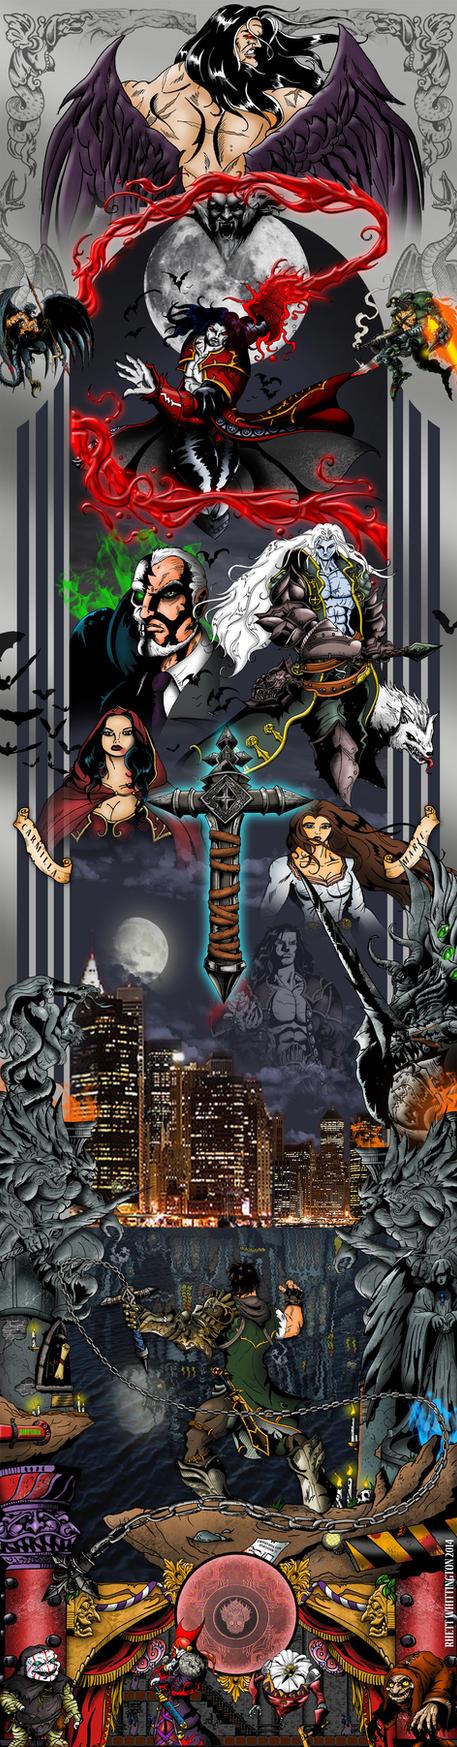 Castlevania Lords of Shadow 2 poster by whittingtonrhett